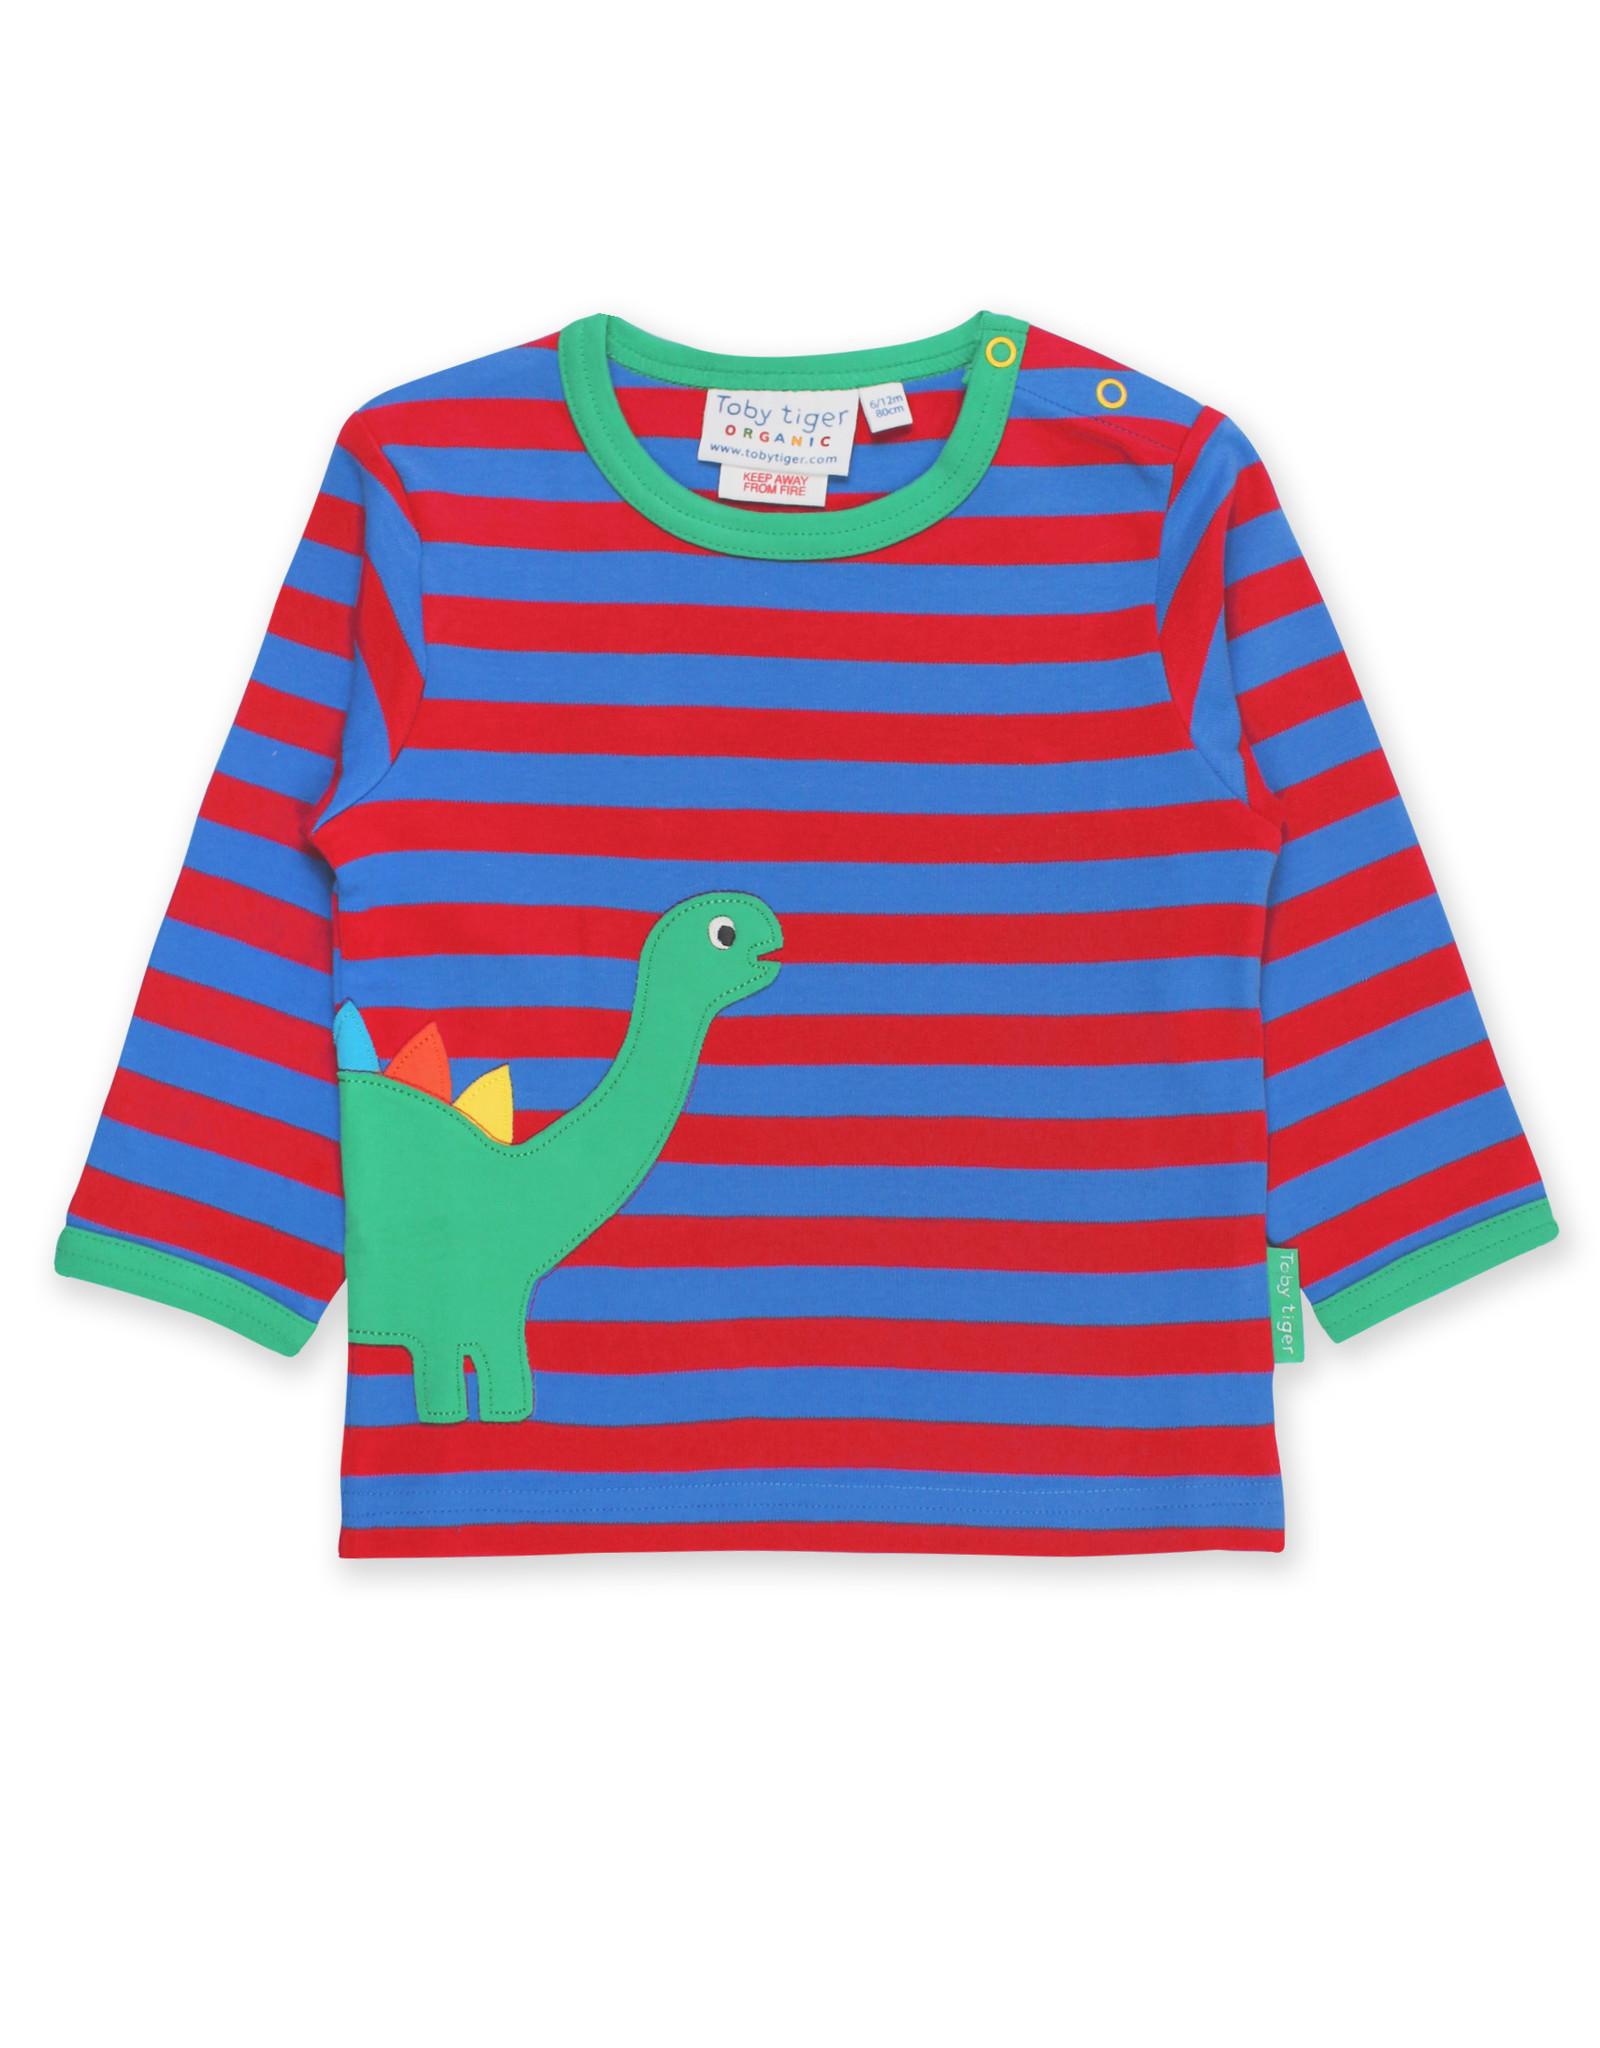 Toby Tiger Kinder shirt - dino saurus